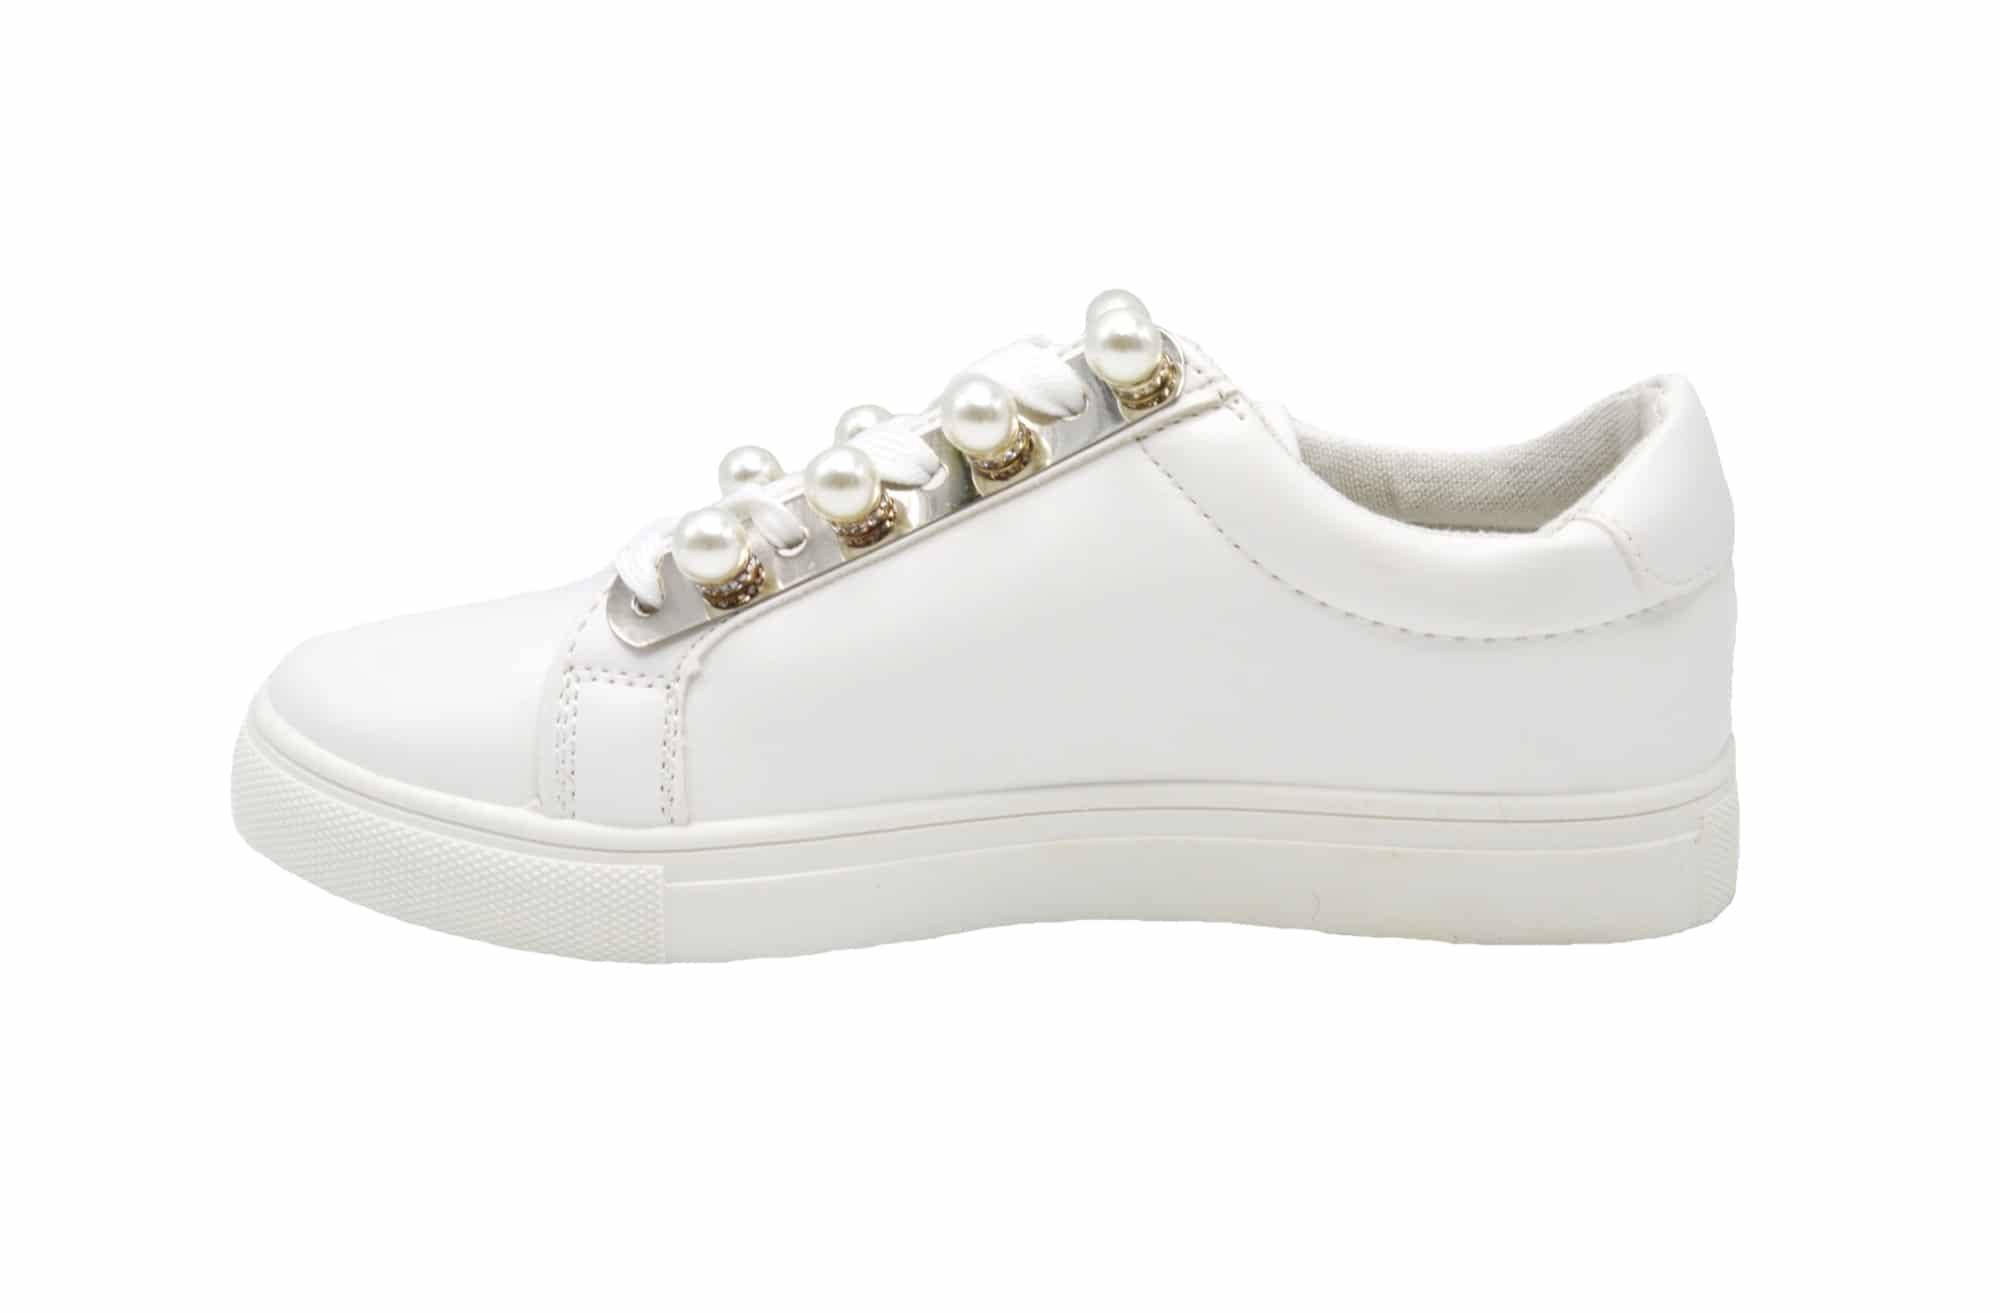 Sneakers Cuir Shy51Baskets Blanc Tennis Simili Avec Perles Basses qMVSGUzp